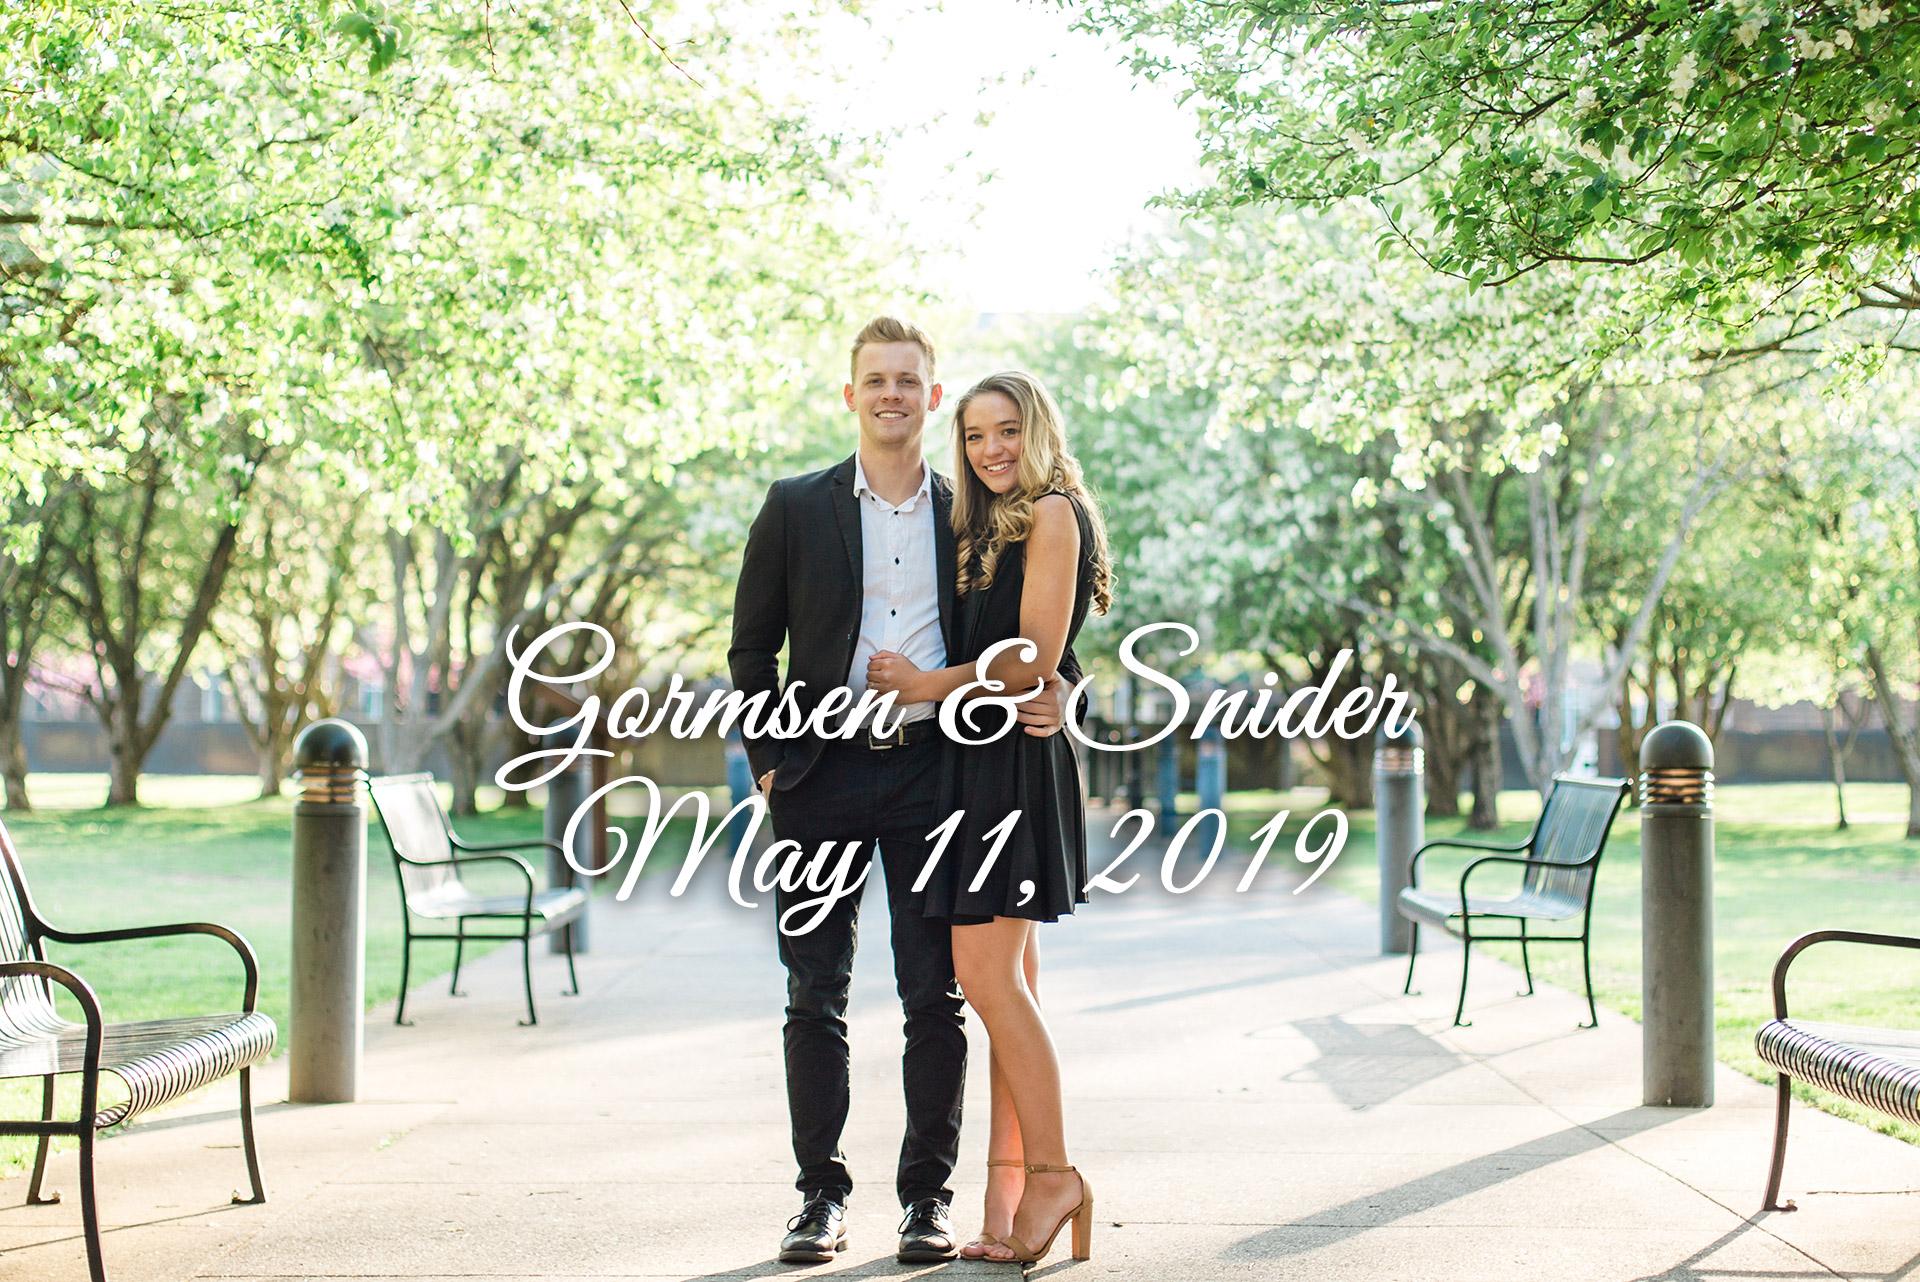 Gormsen-Snider Remnant Fellowship Wedding